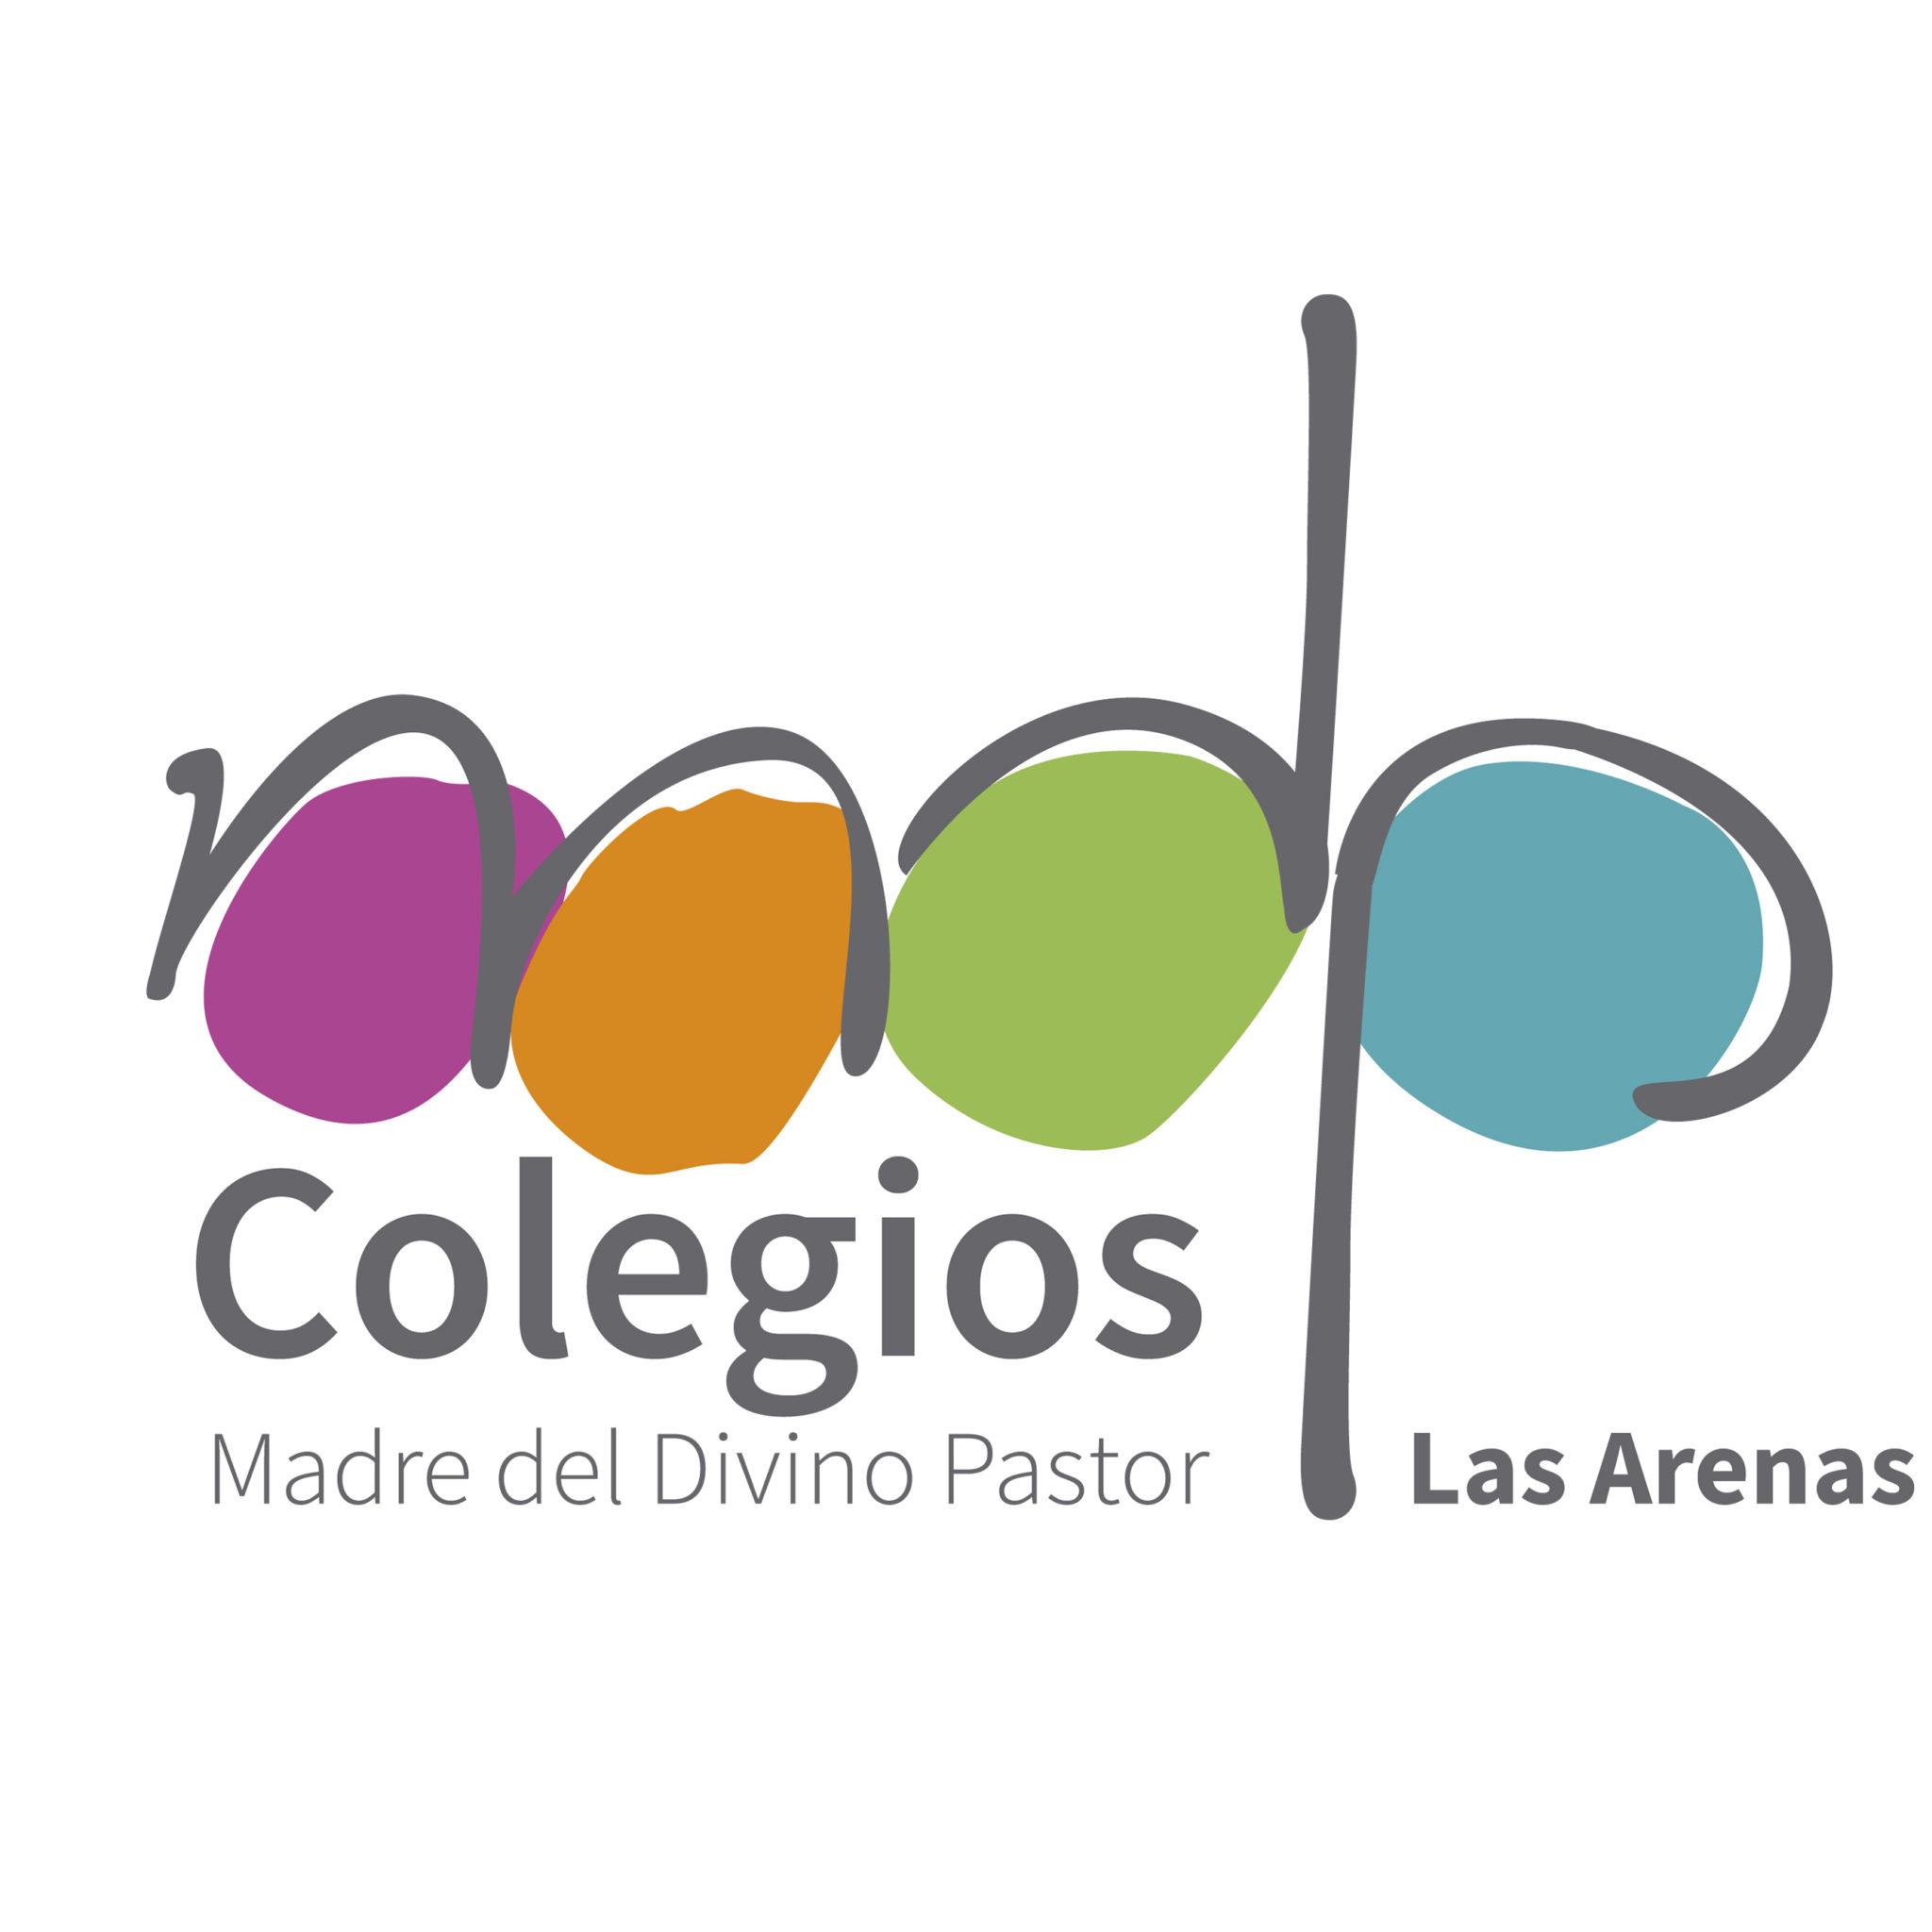 Logo MADRE DEL DIVINO PASTOR